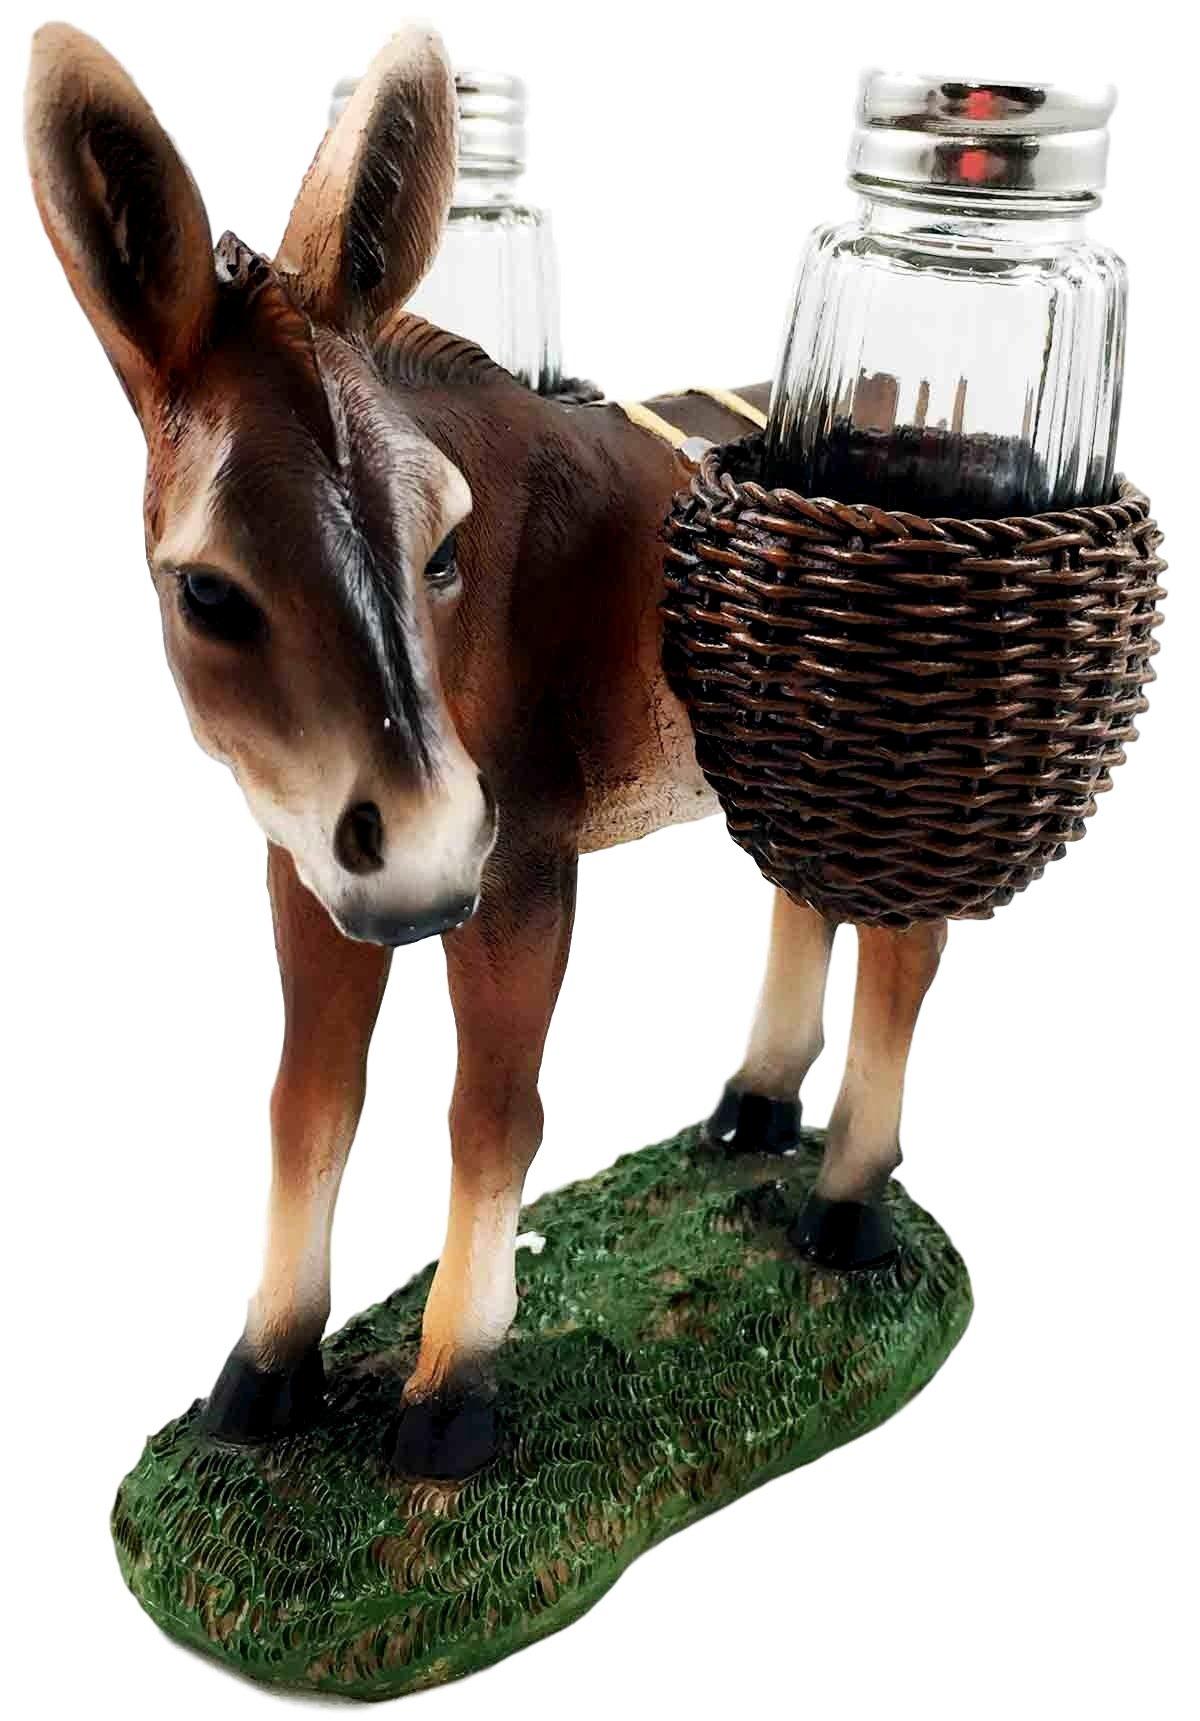 Animal Farm Donkey Carrying Saddlebags Of Spice Figurine Salt Pepper Shakers Holder Kitchen Decor Centerpiece Farmers Animal Lovers